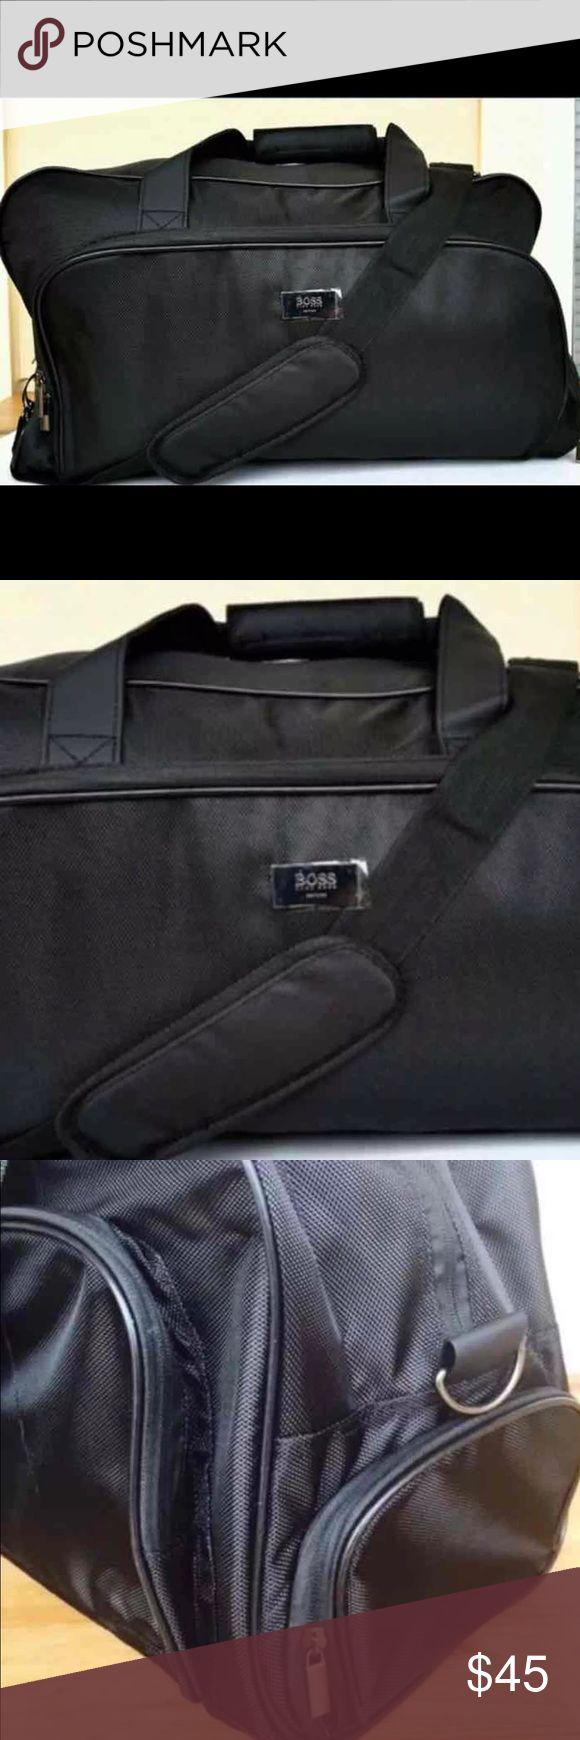 TWO BAGS 💼 Hugo Boss perfume bag Hugo Boss perfume travel case/ Bag rough material HUGO Bags Travel Bags